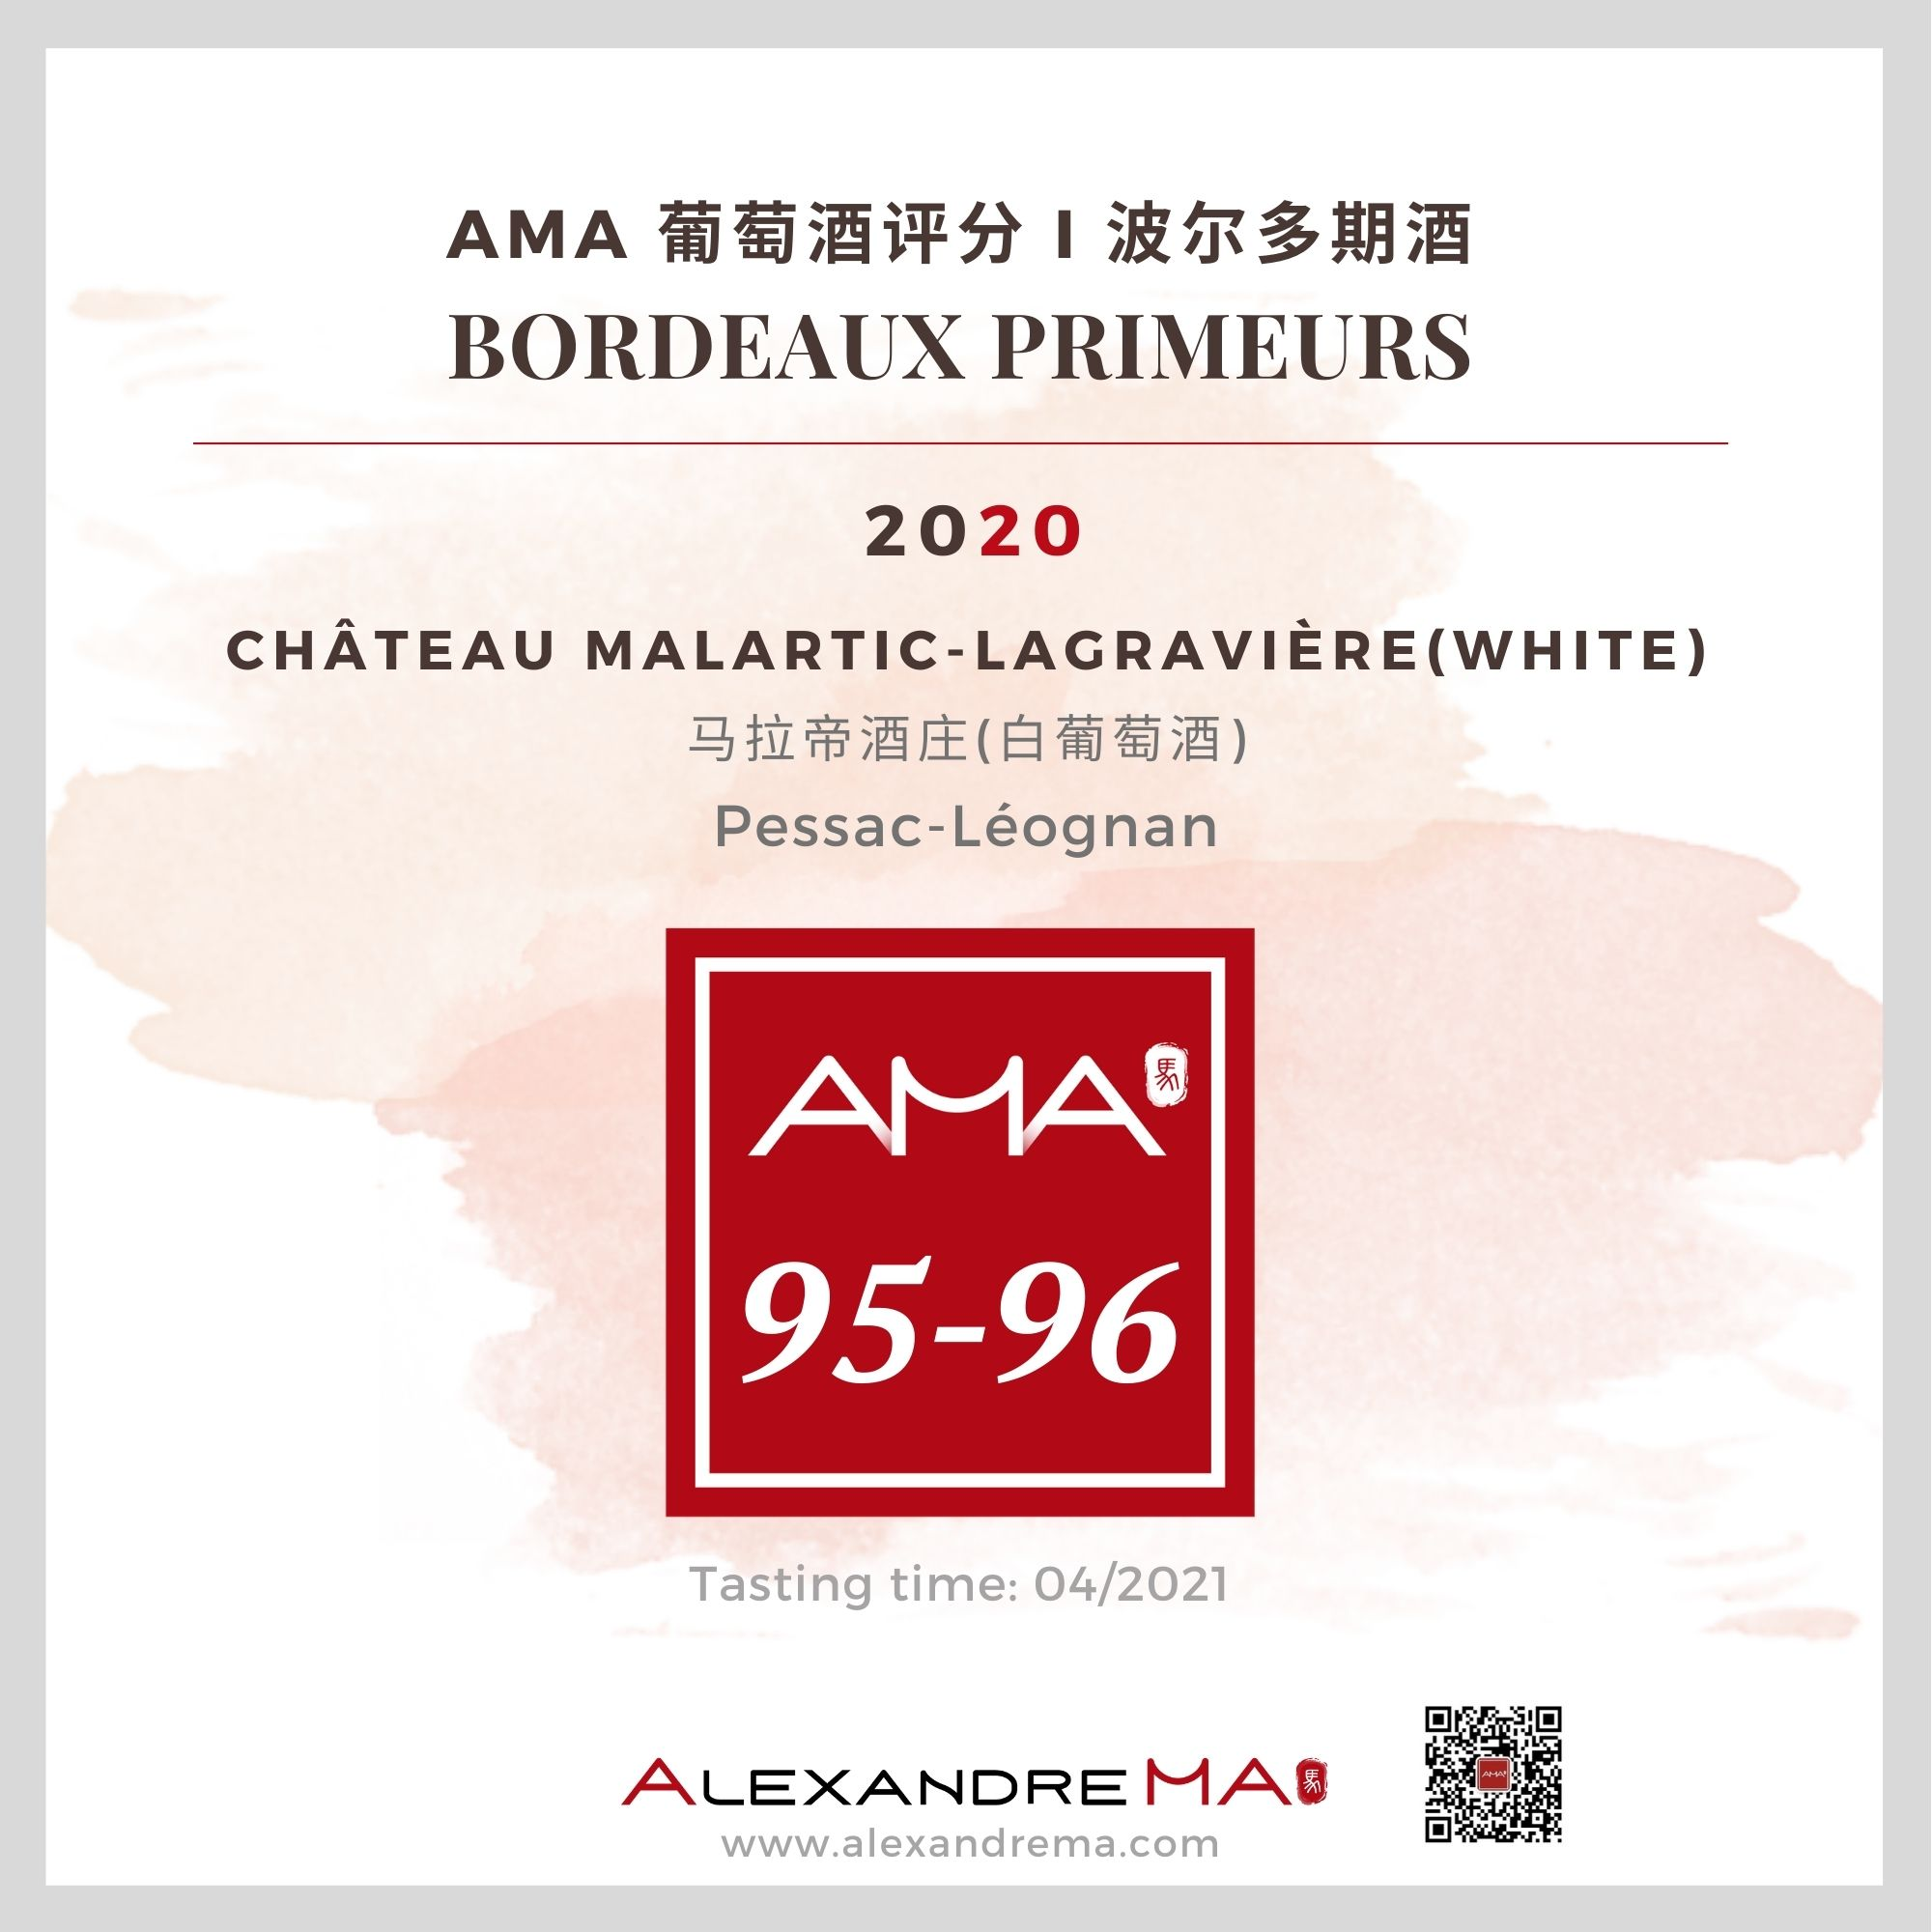 Château Malartic-Lagravière White 2020 - Alexandre MA